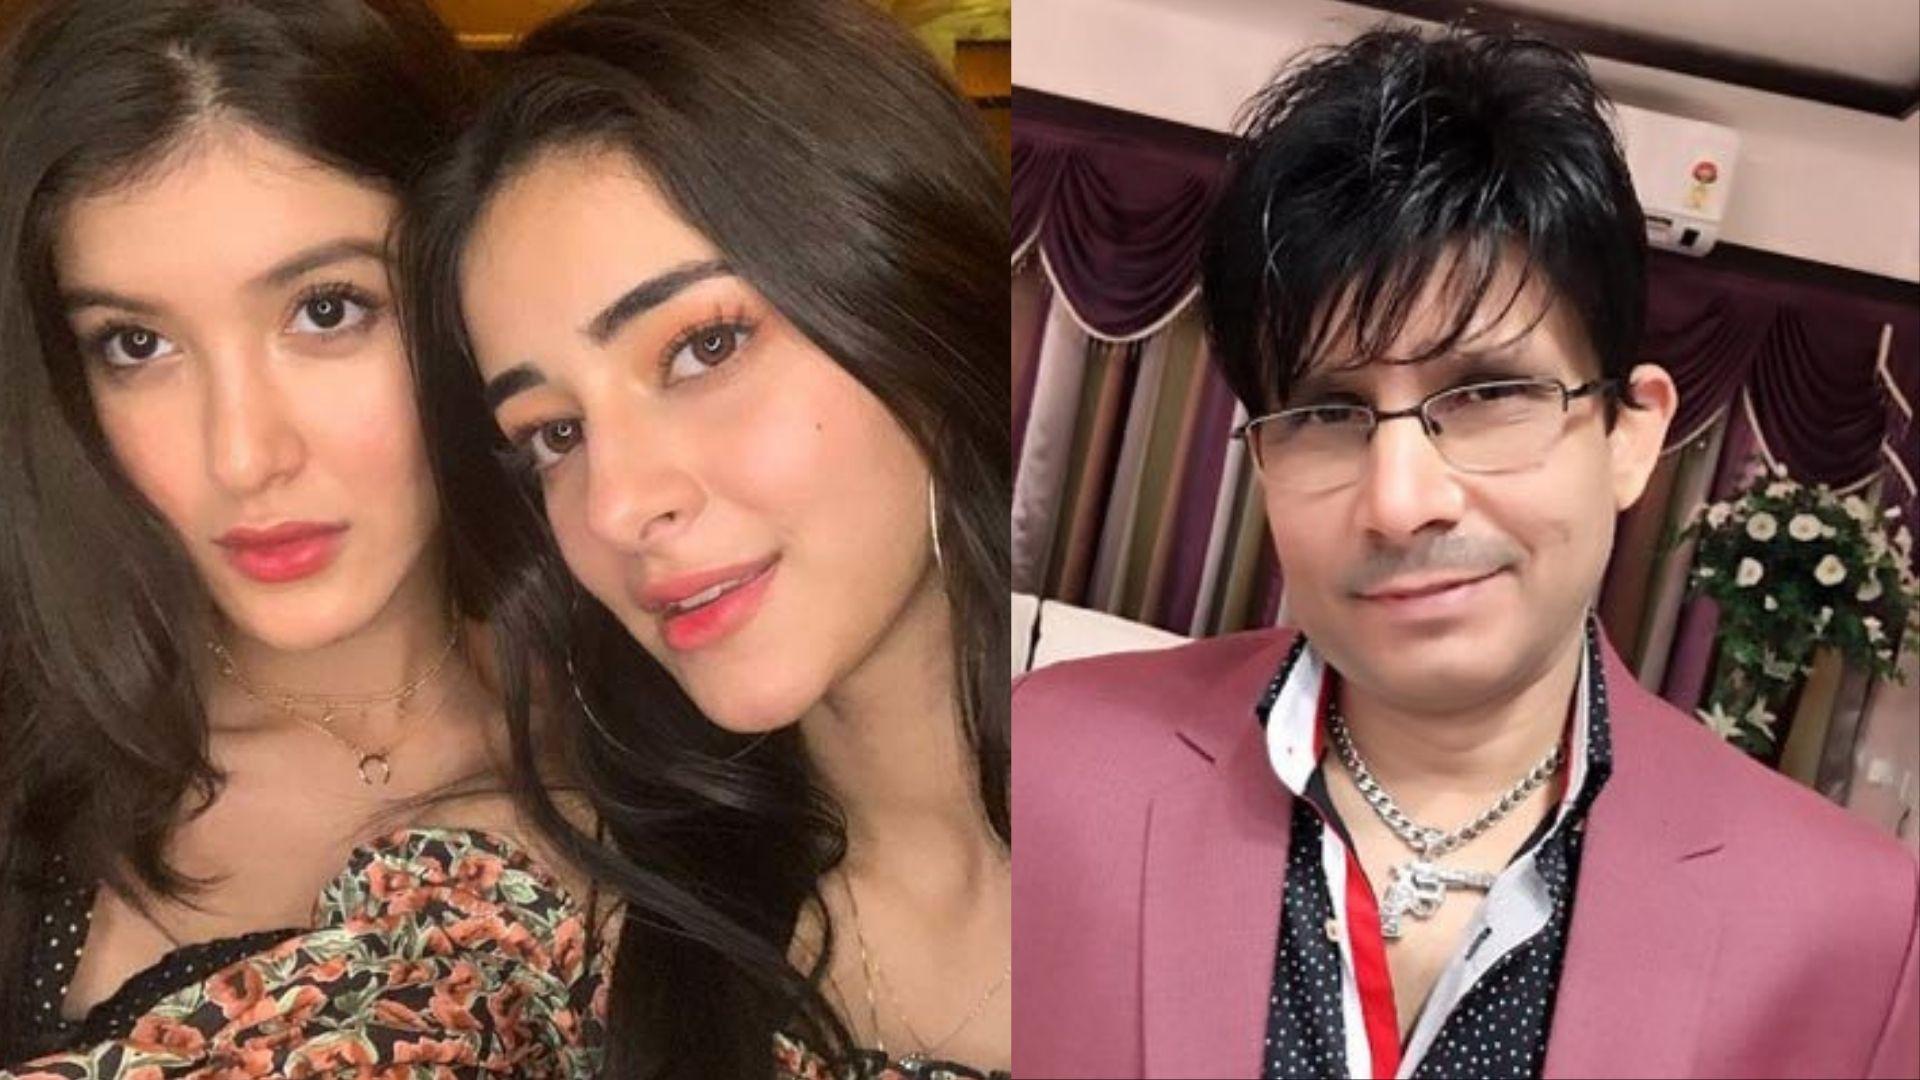 Aryan Khan Arrest Case: Kamaal R Khan Takes A Dig At Ananya Panday And Calls Her 'Biggest Fool'; KRK Predicts Shanaya Kapoor Is On NCB's Radar